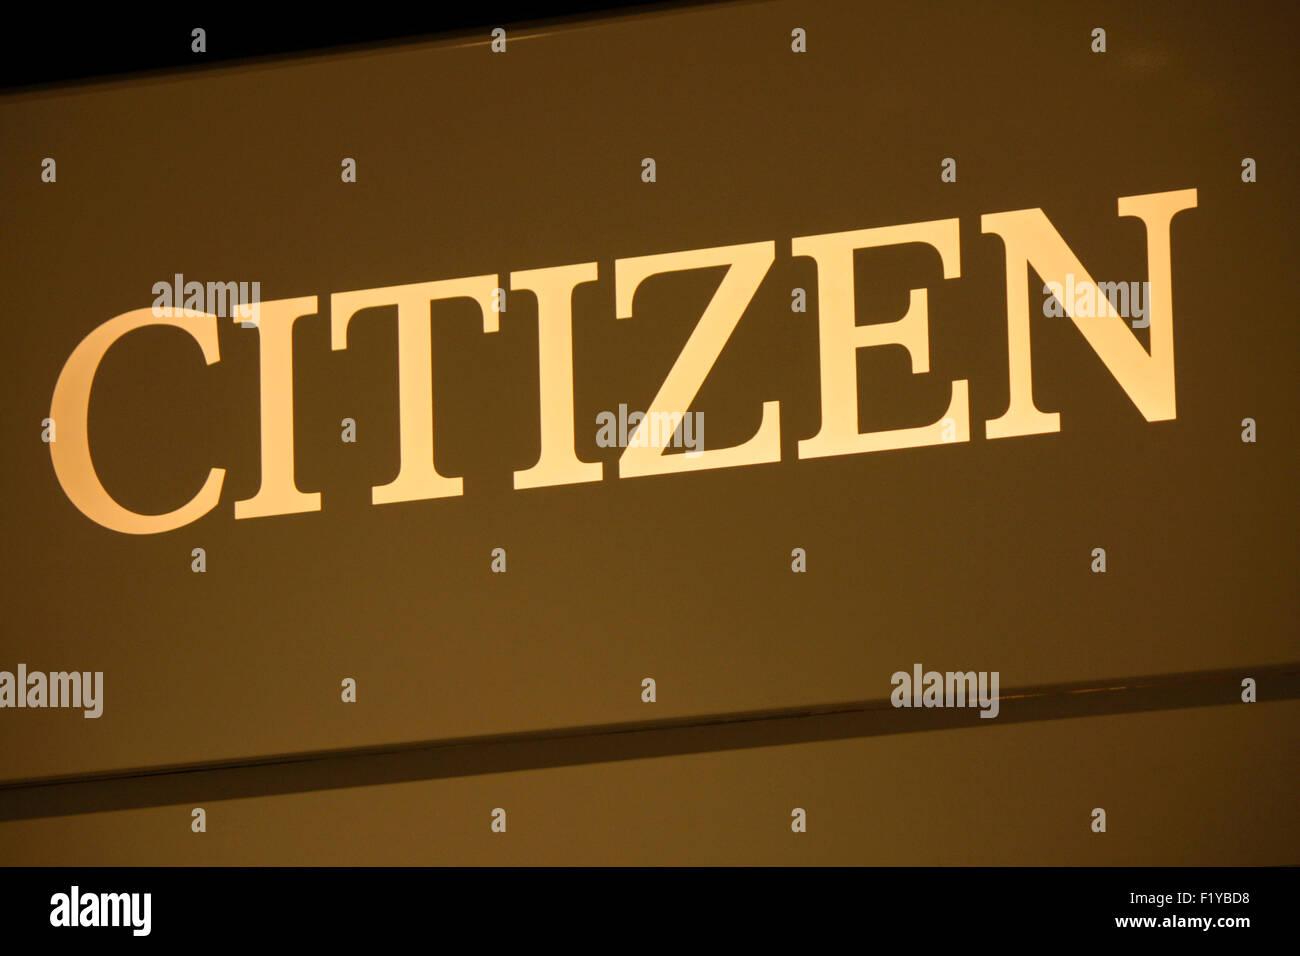 Markenname: 'Citizen', Dezember 2013, Berlin. - Stock Image